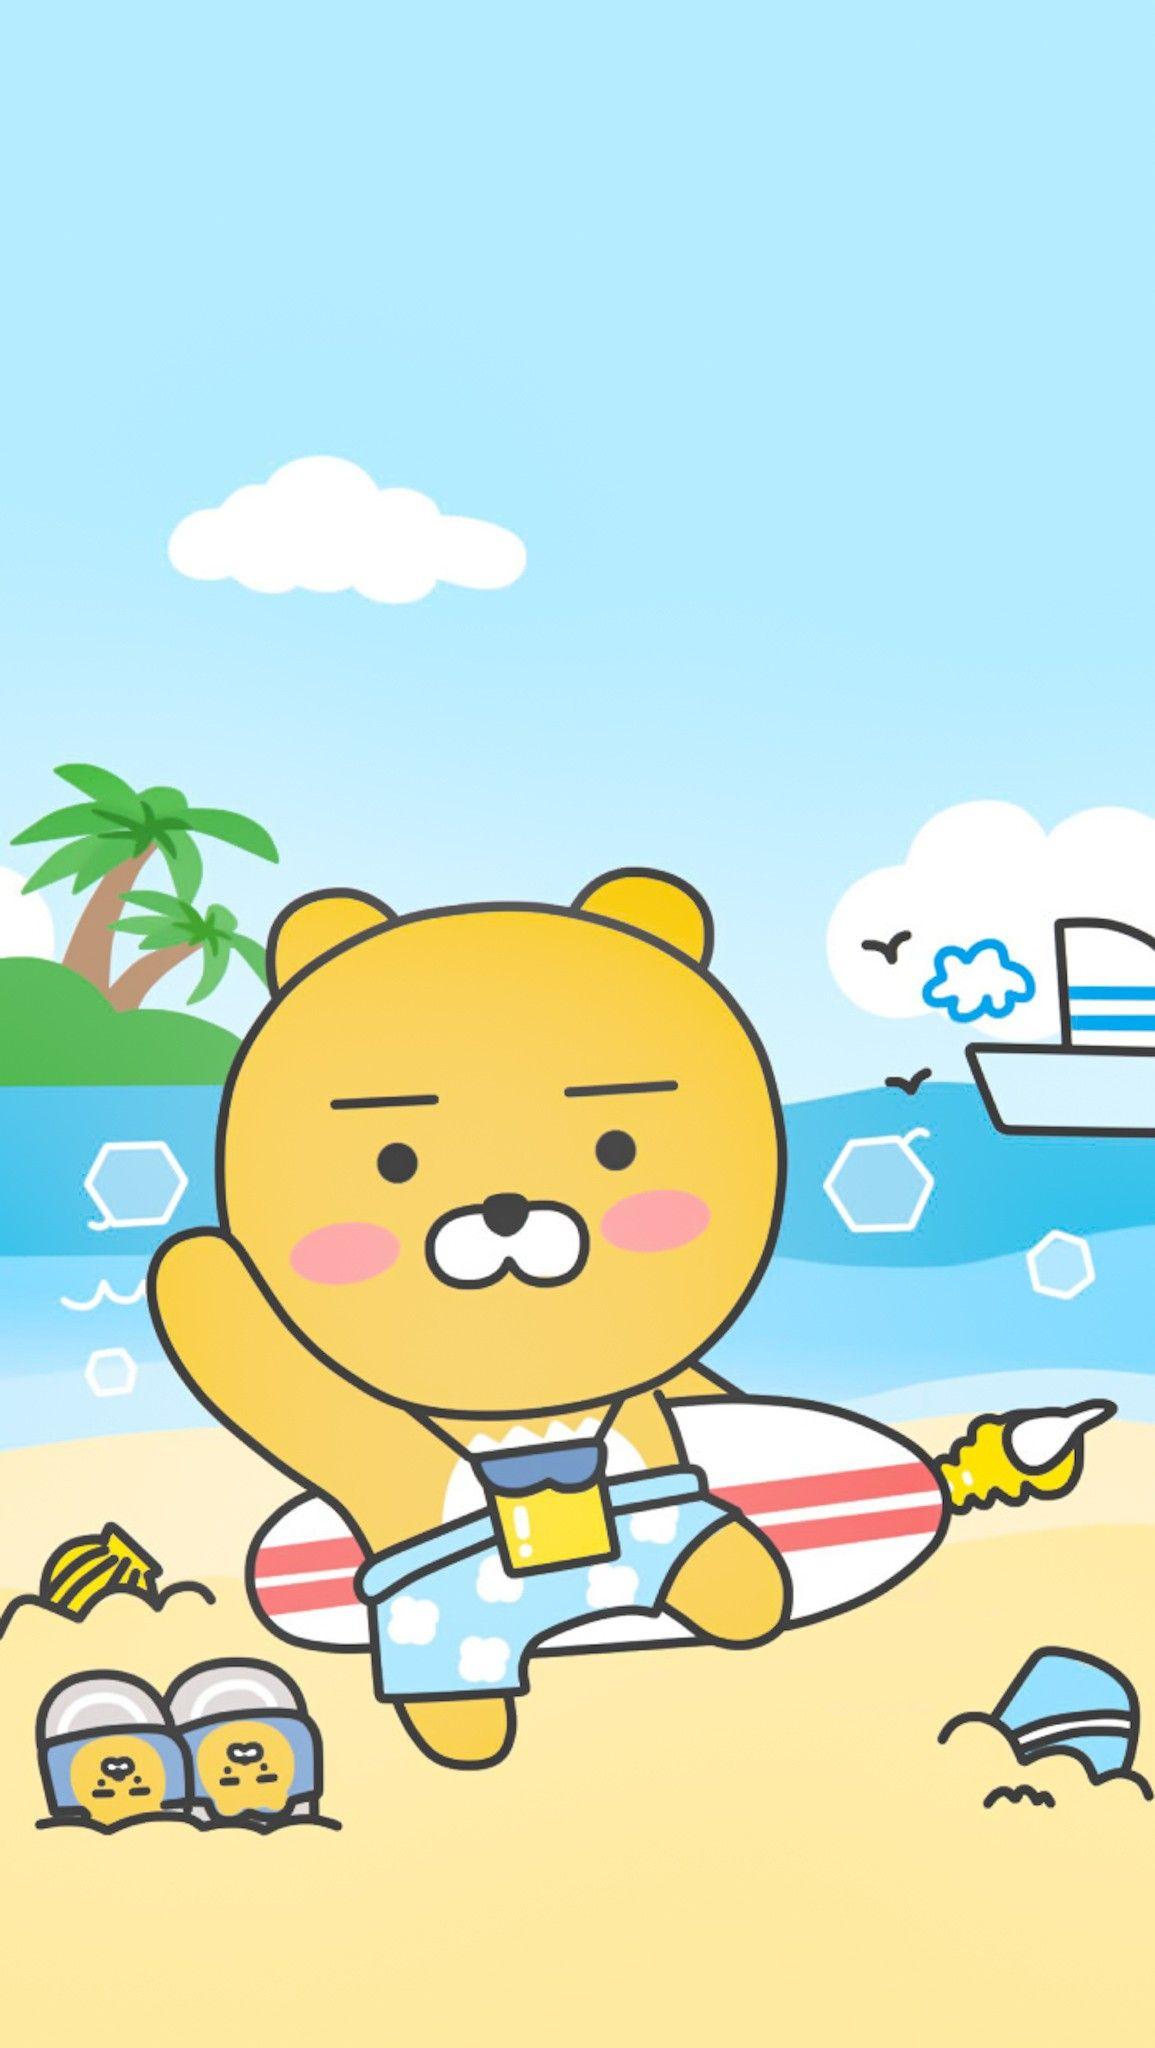 Pin by eto o on Ryan | Kakao friends, Cute cartoon, Cartoon